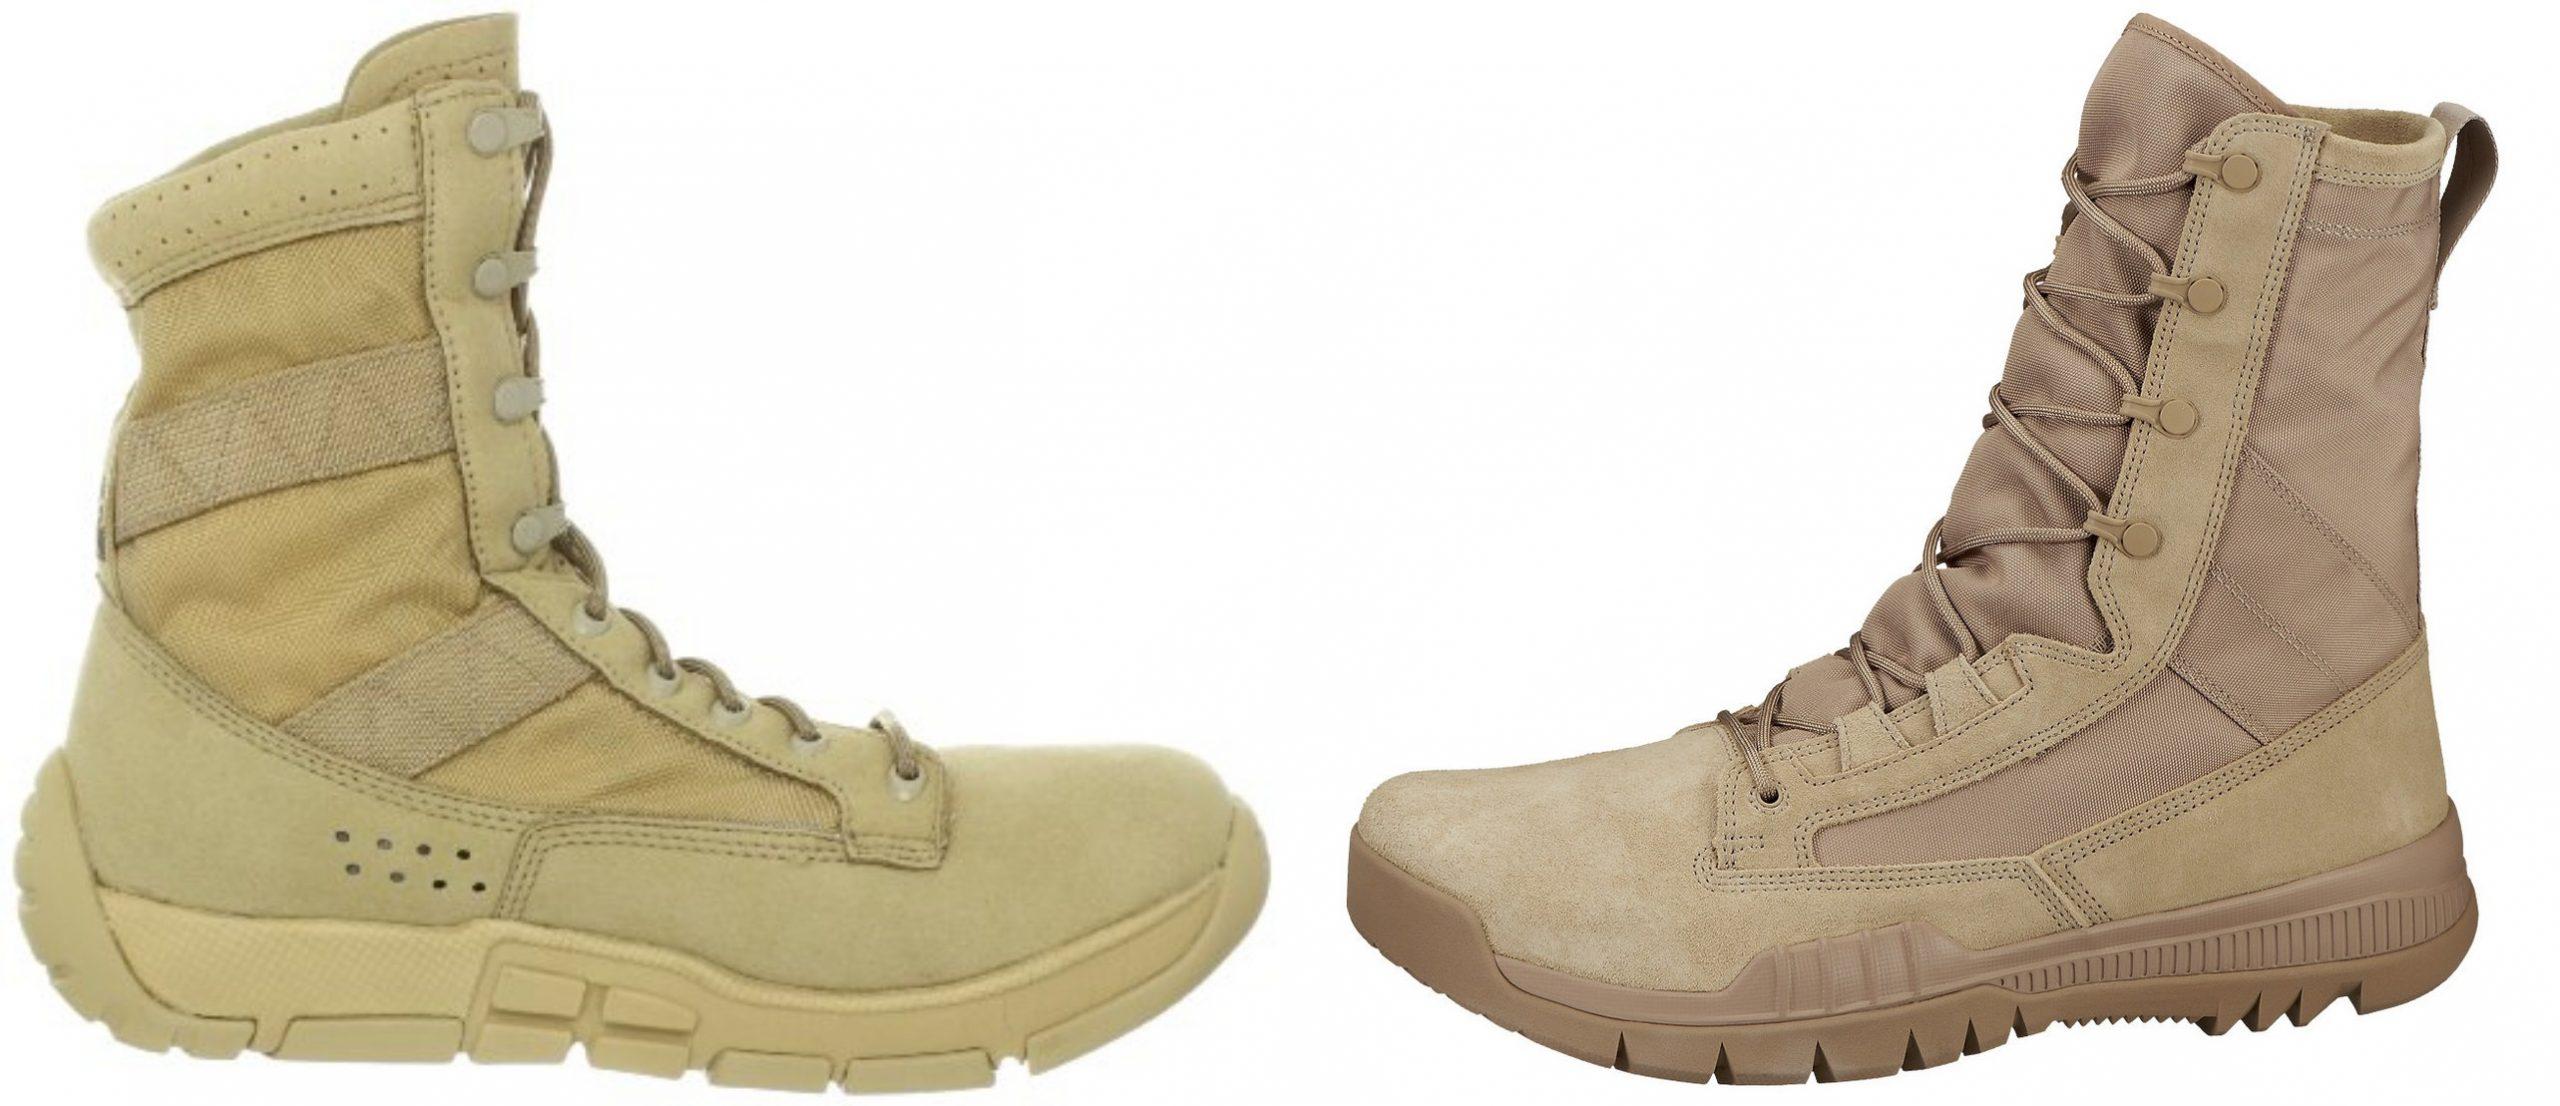 3b9acf5b378a Nike Sage Green Boots Size 6